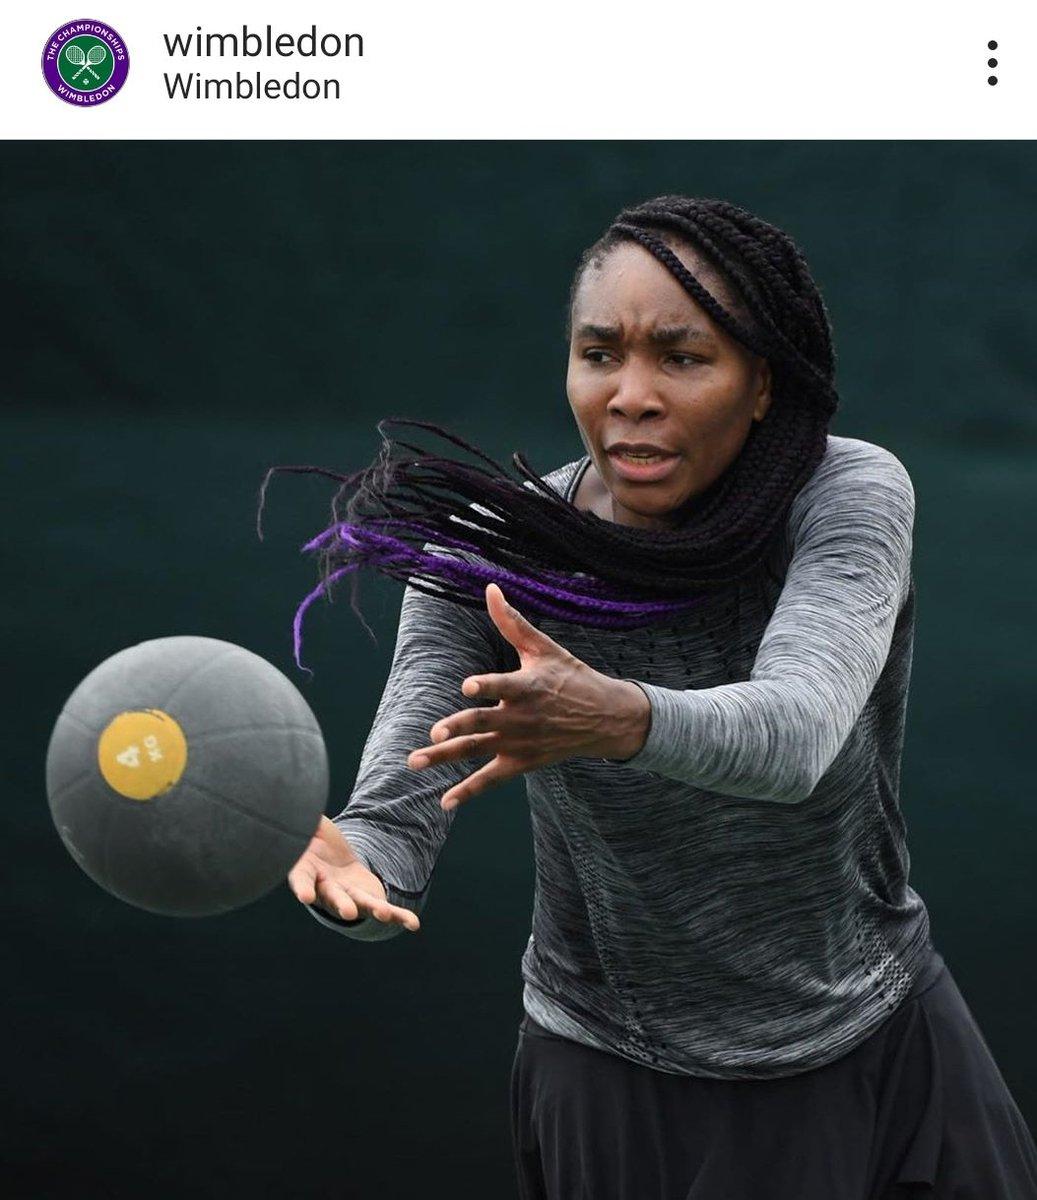 Venus already training at Wimbledon  #venuswilliams<br>http://pic.twitter.com/IyRXRbKsc4